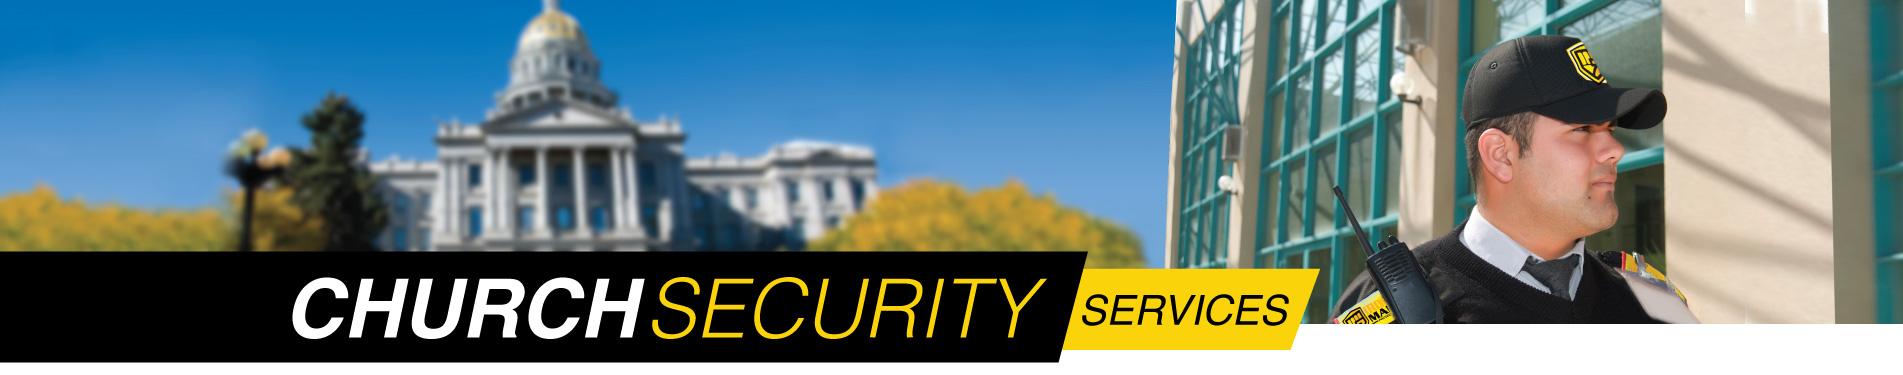 Houston area religious facilities security services